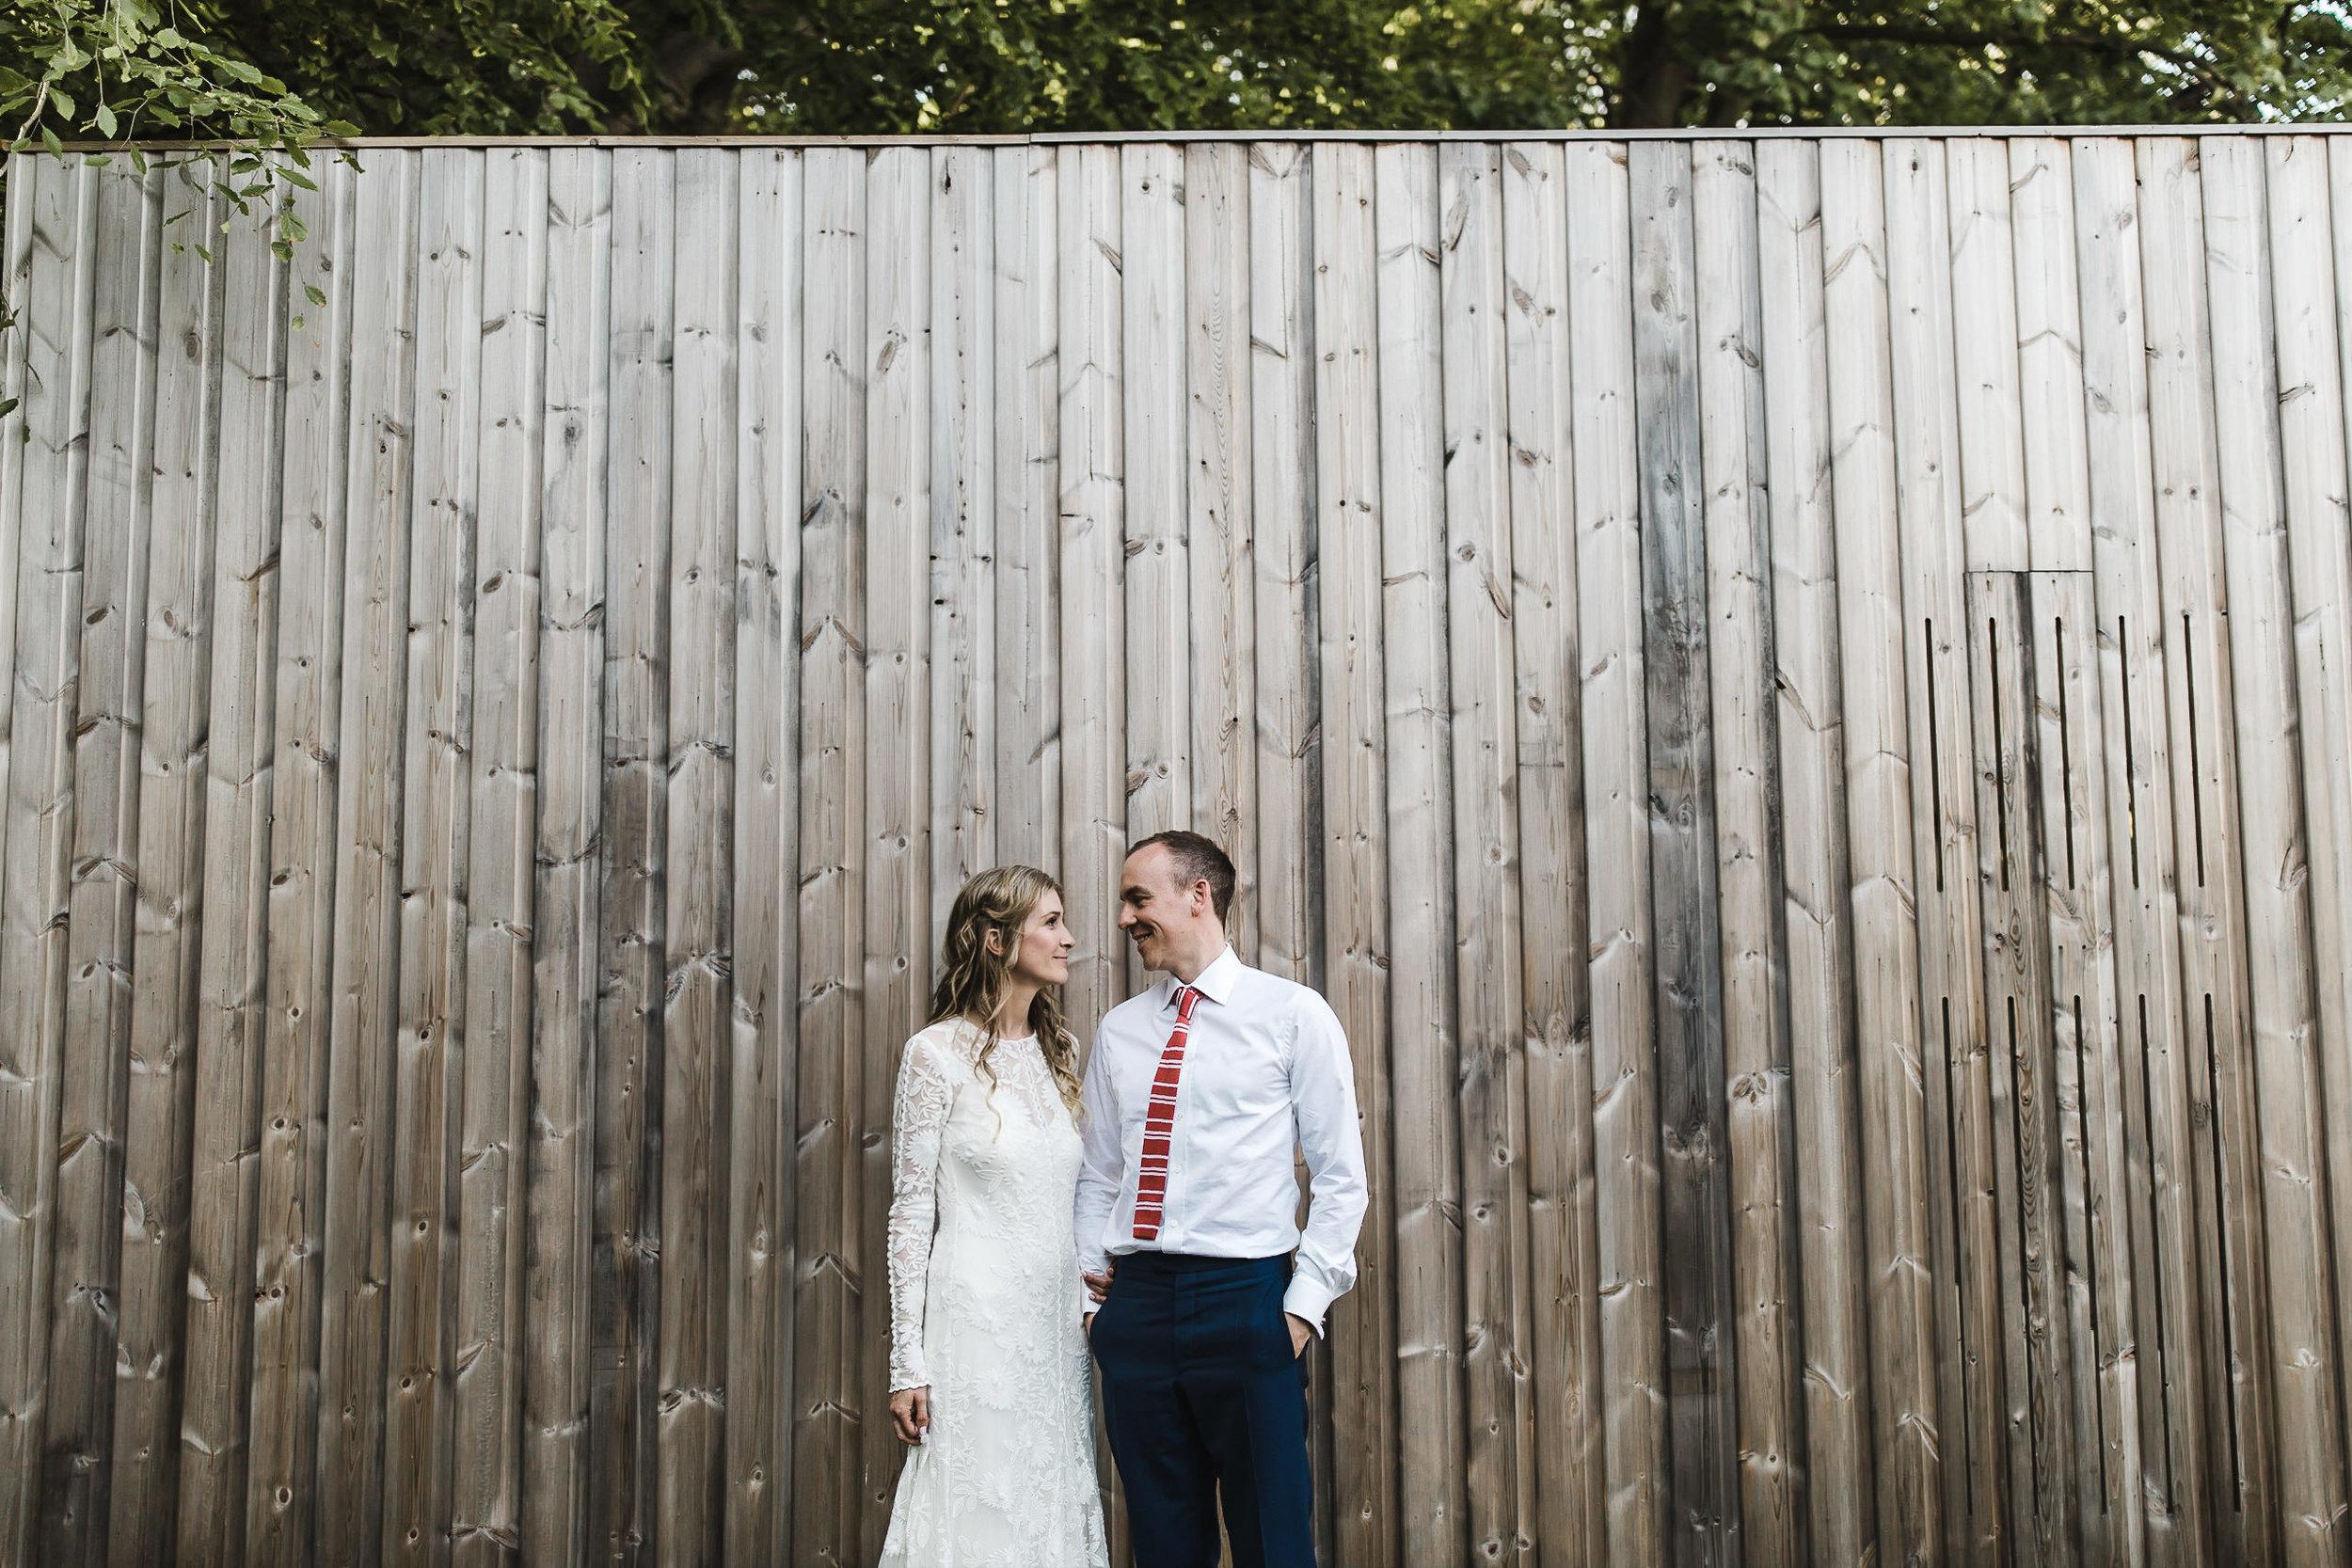 Roundhay-Leeds-Backyard-Wedding-Becs-Chris-181.jpg